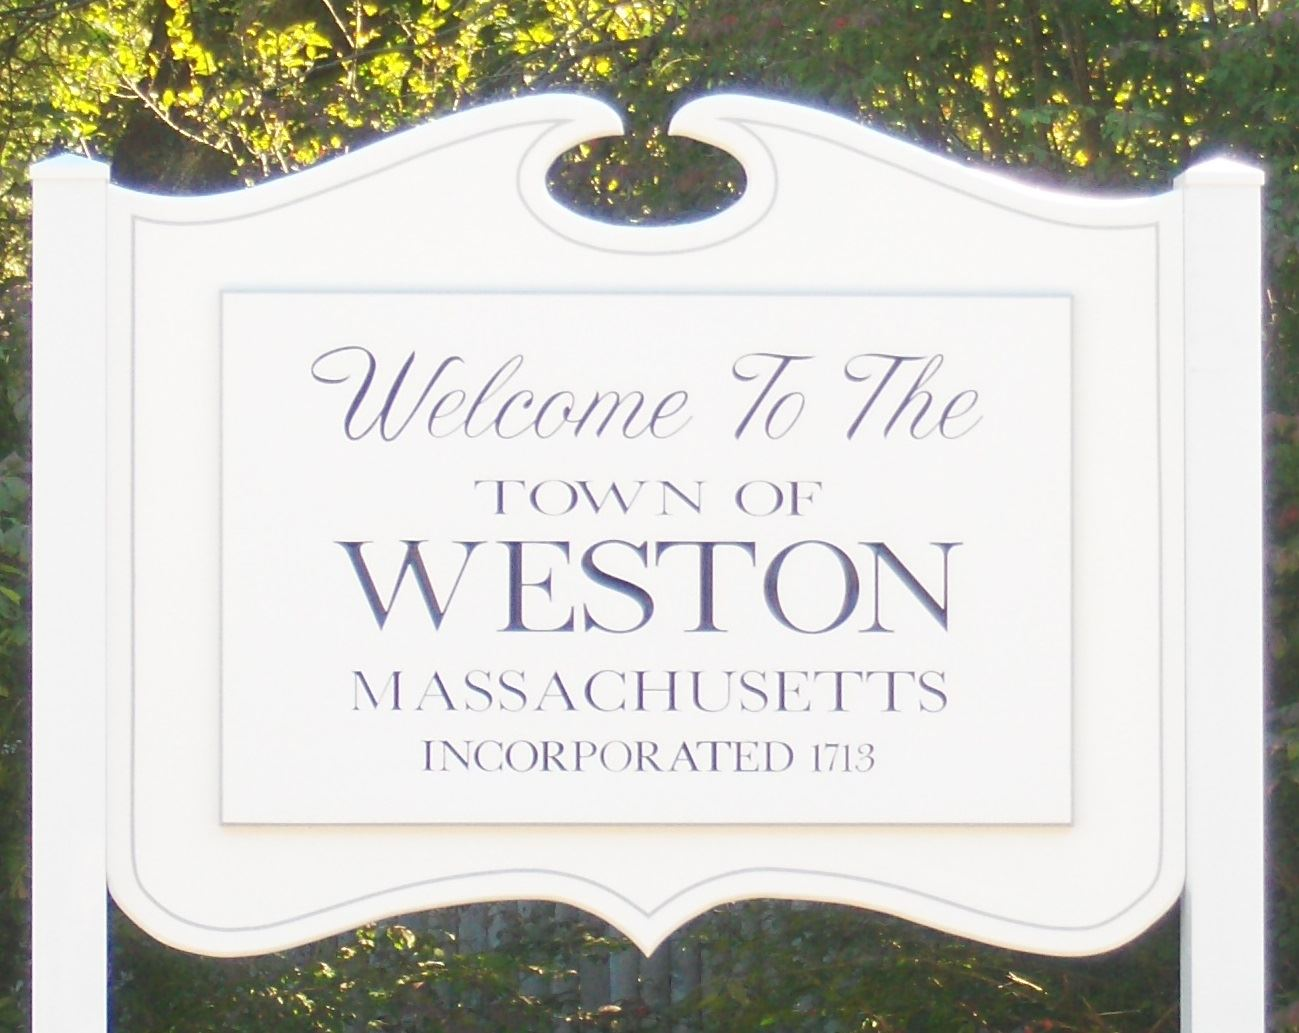 WelcomeWeston